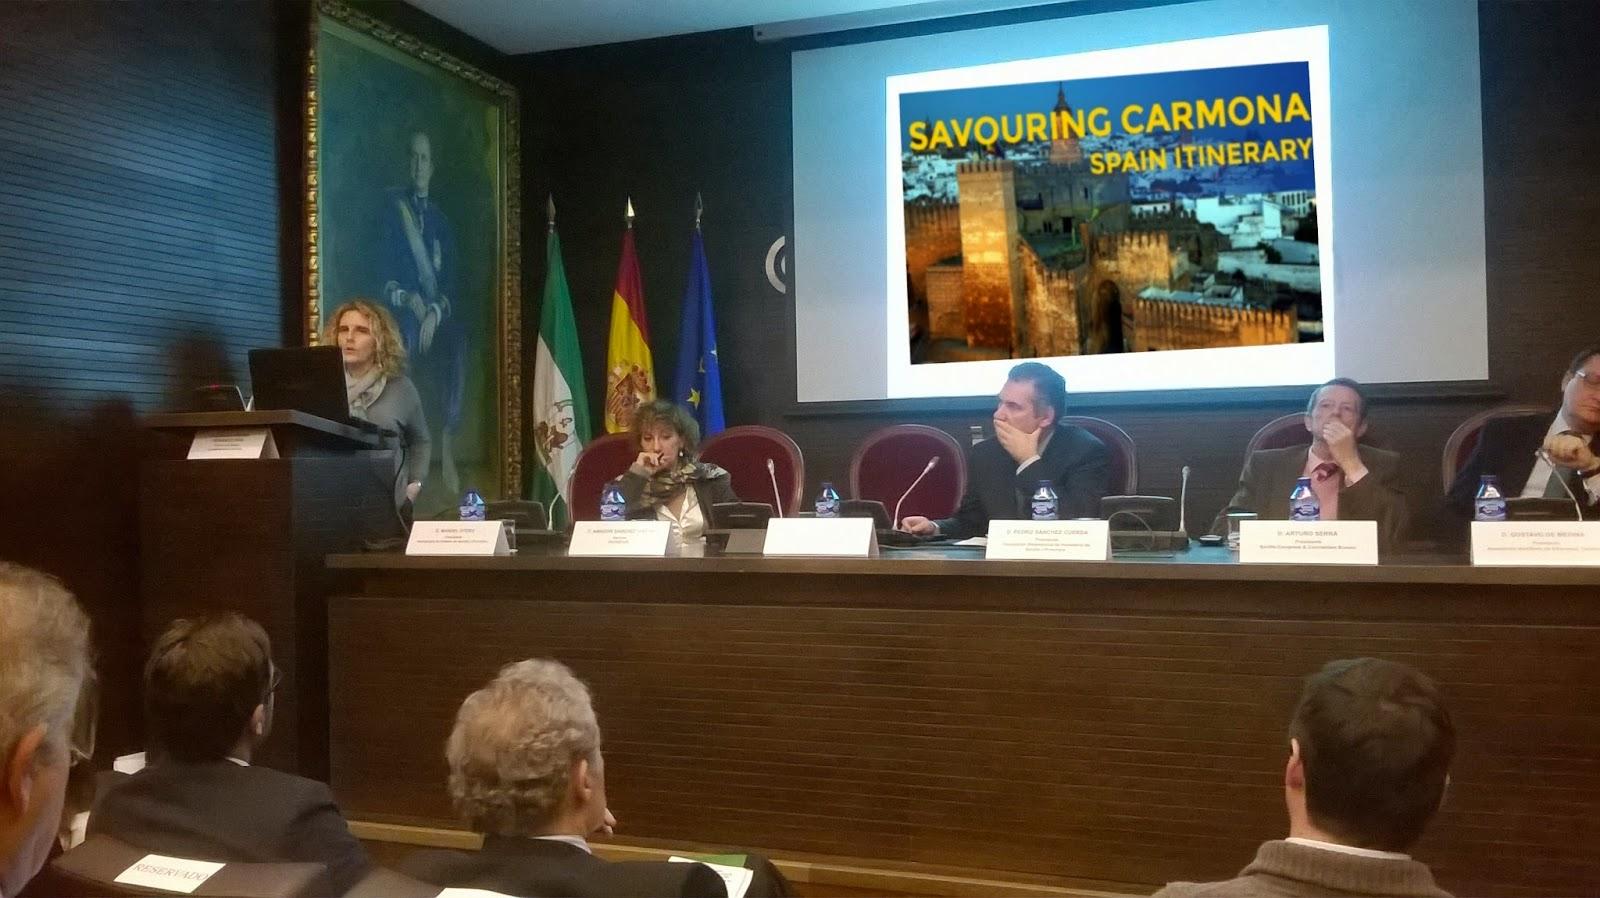 Oficina de turismo de carmona carmona presenta sus rutas for Oficina turismo carmona